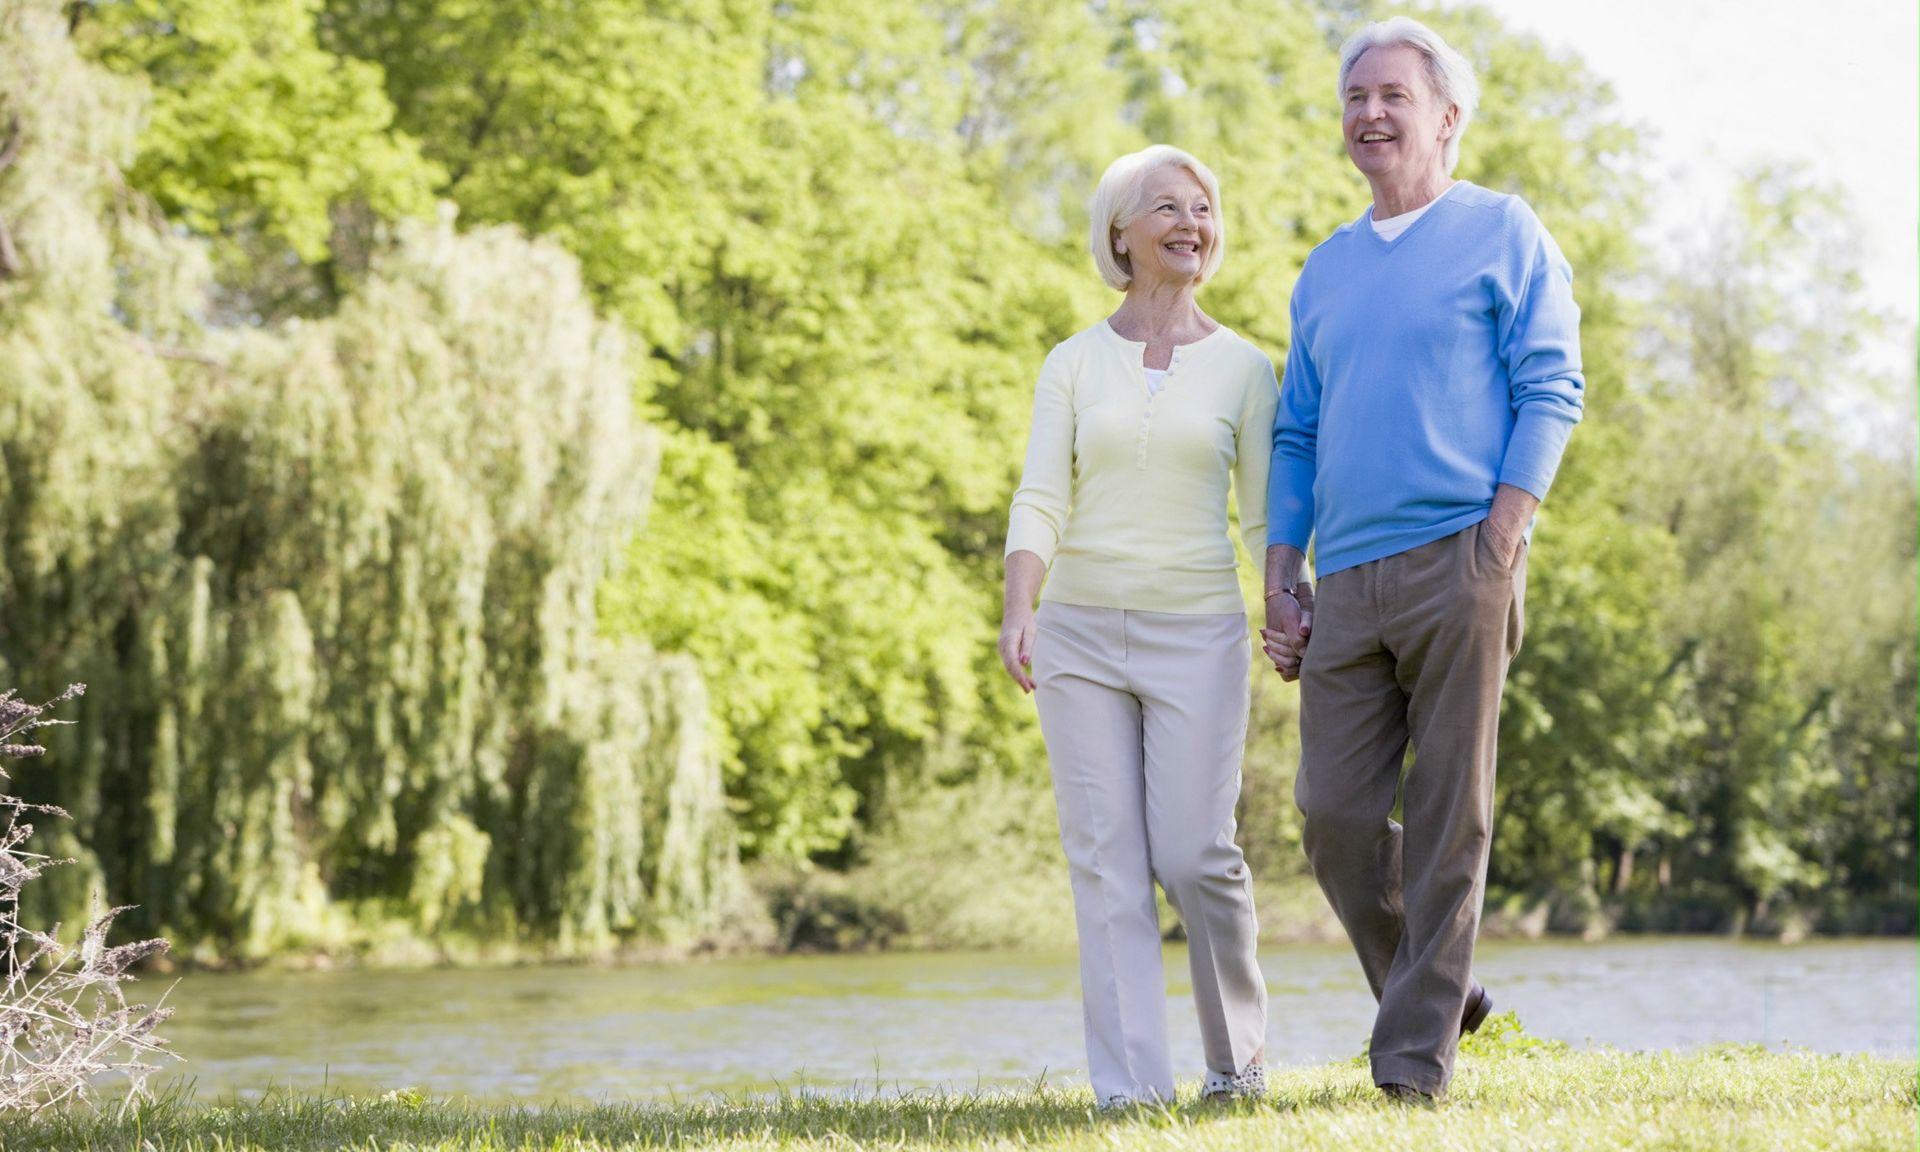 elderly-couple-walk-lake-park-end-of-life-plan-spry12-couple